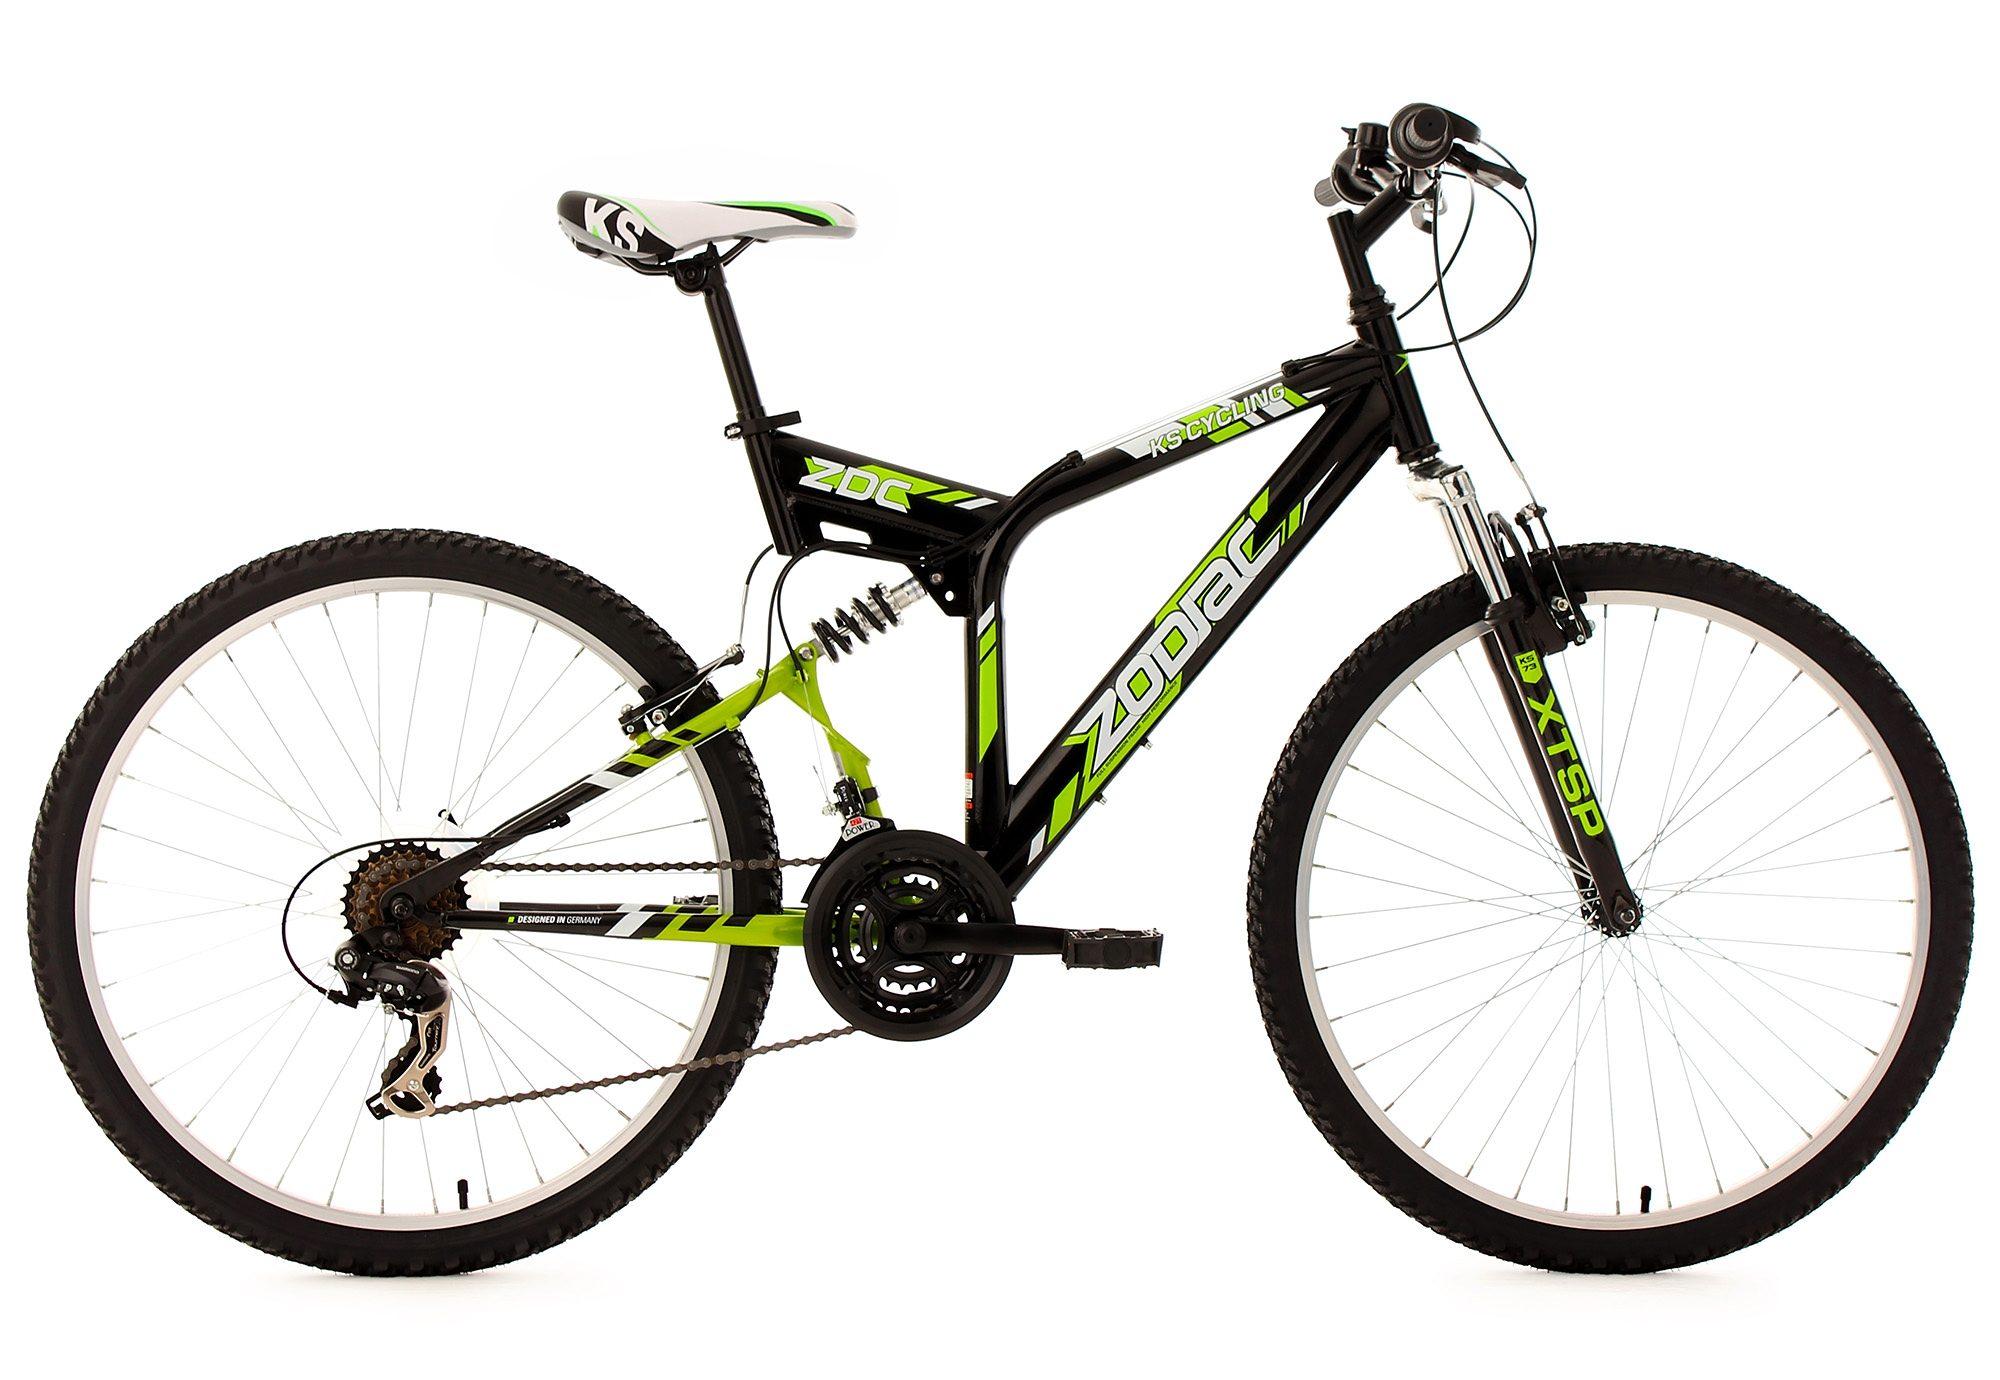 Fully-Mountainbike, 26 Zoll, 21 Gang Kettenschaltung, schwarz, »Zodiac«, KS Cycling